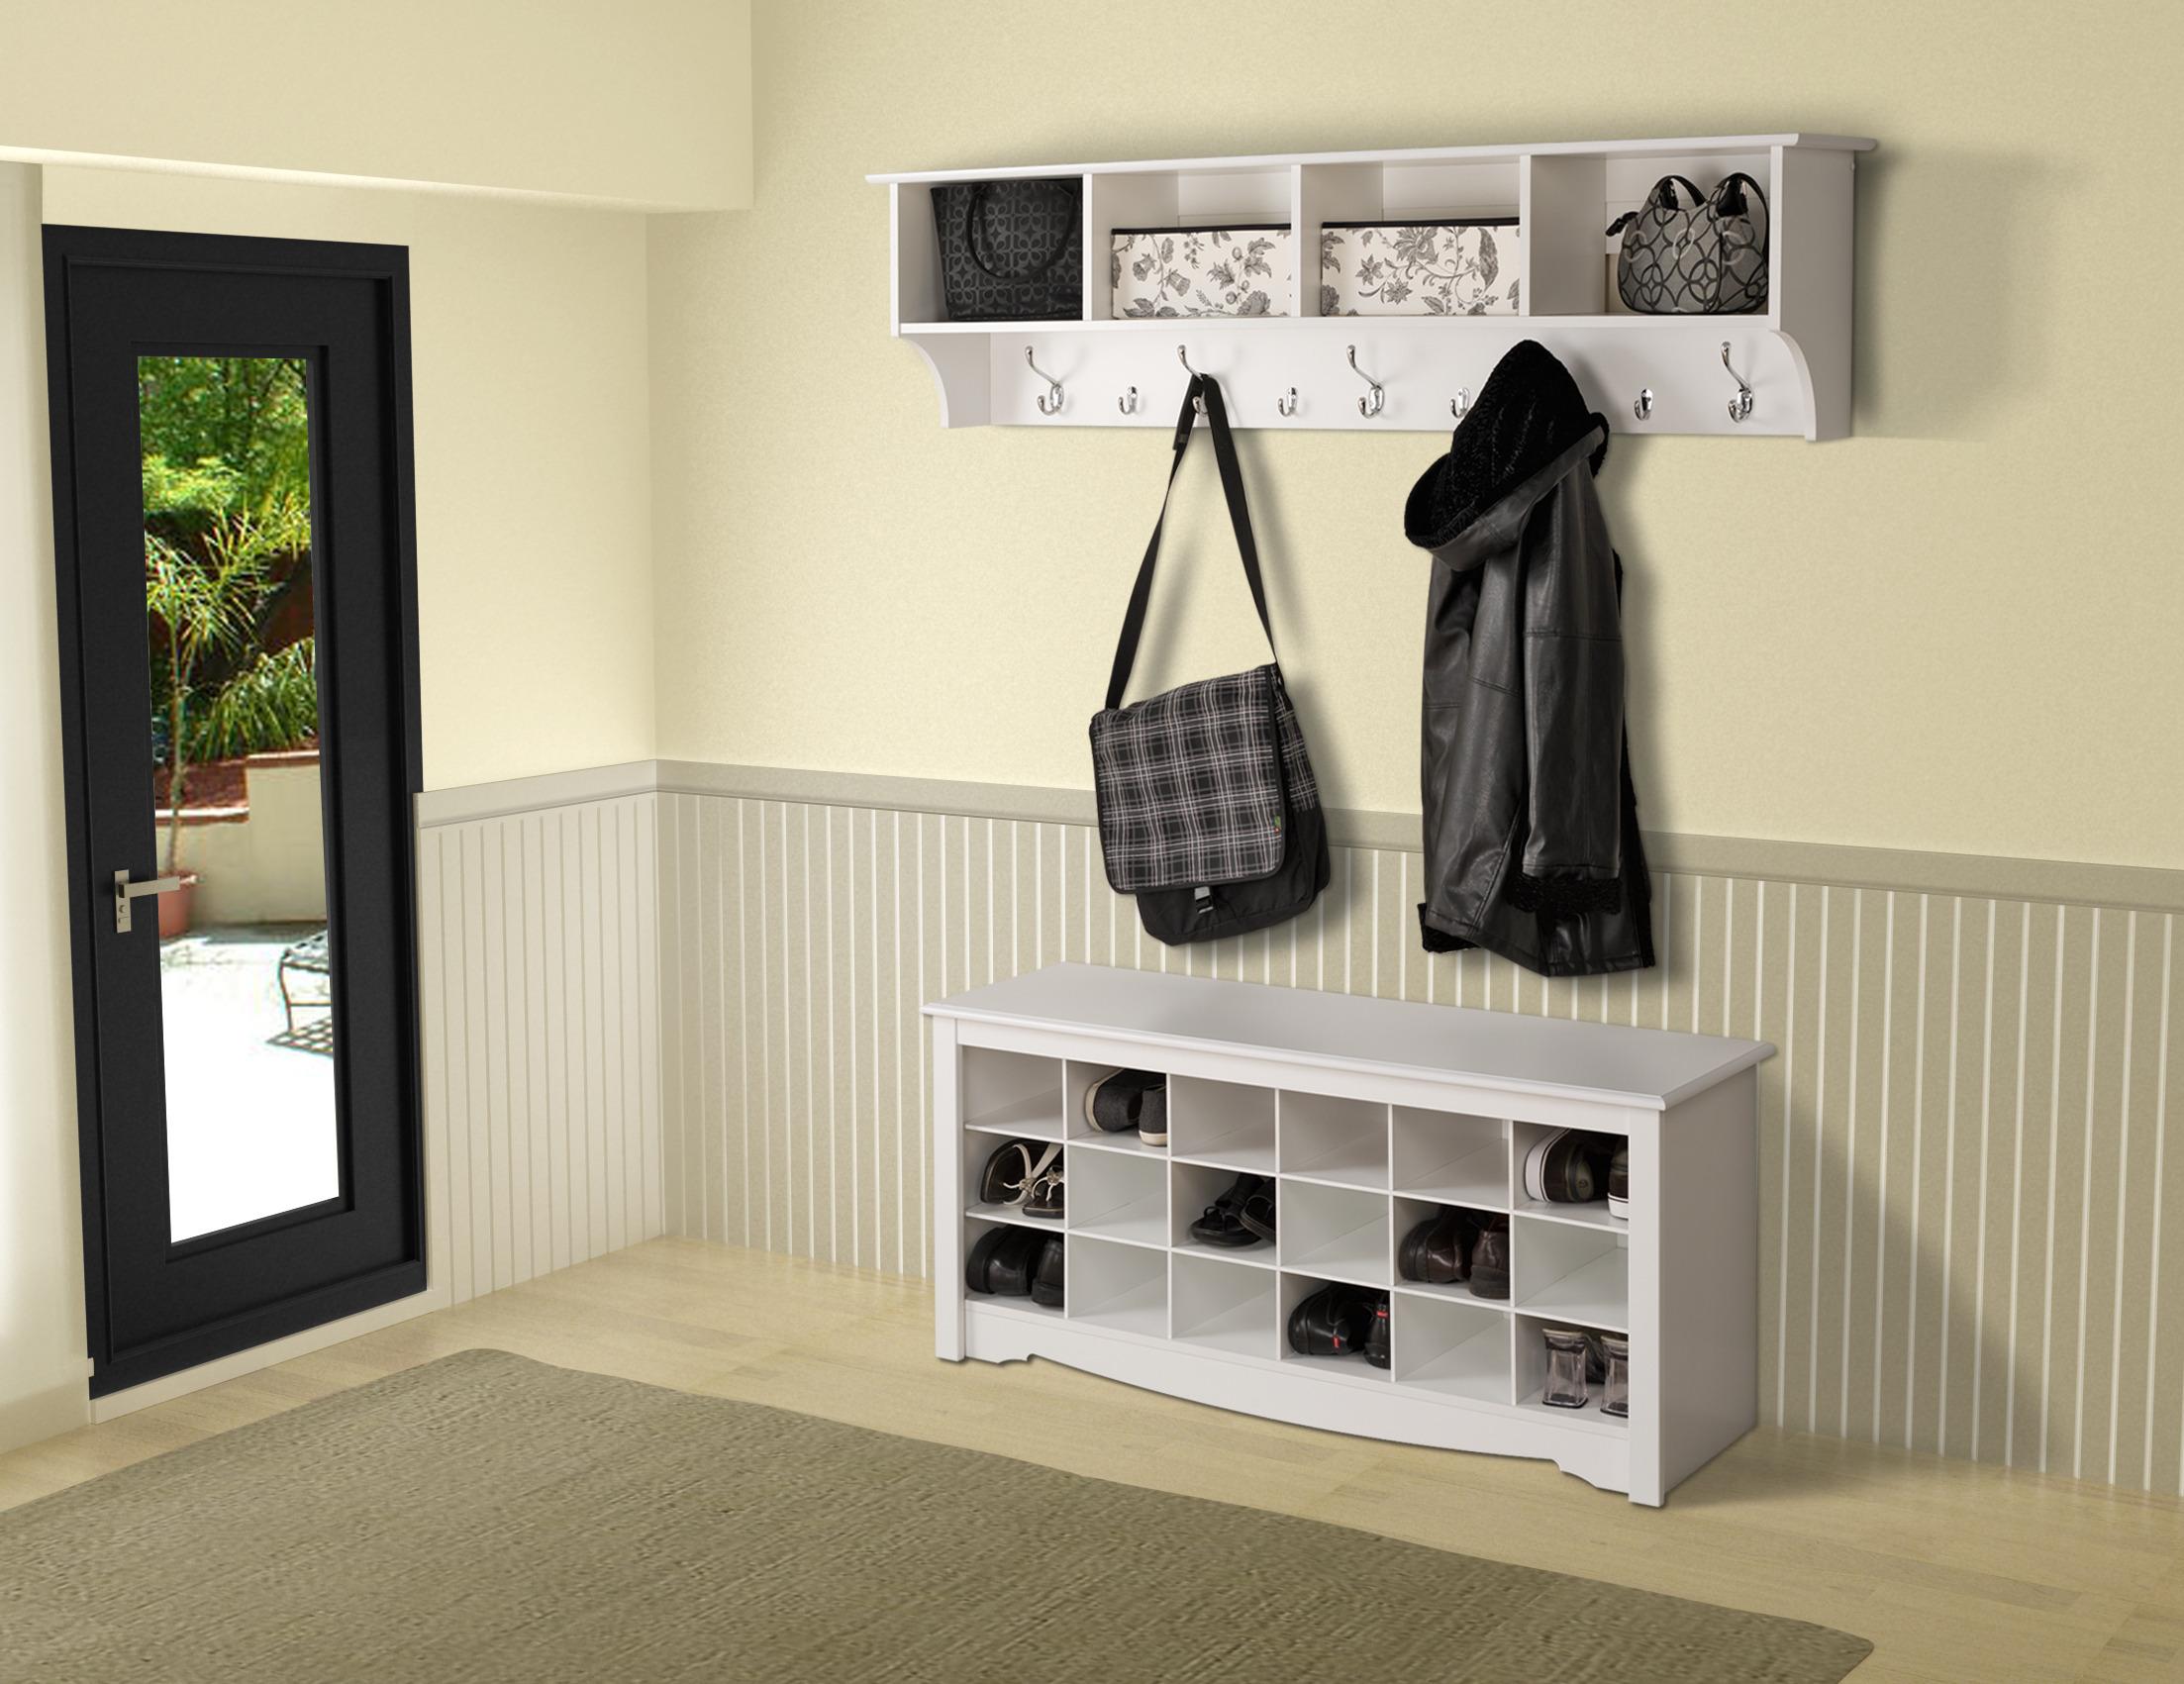 Entryway Shelf - Modern Interior Design